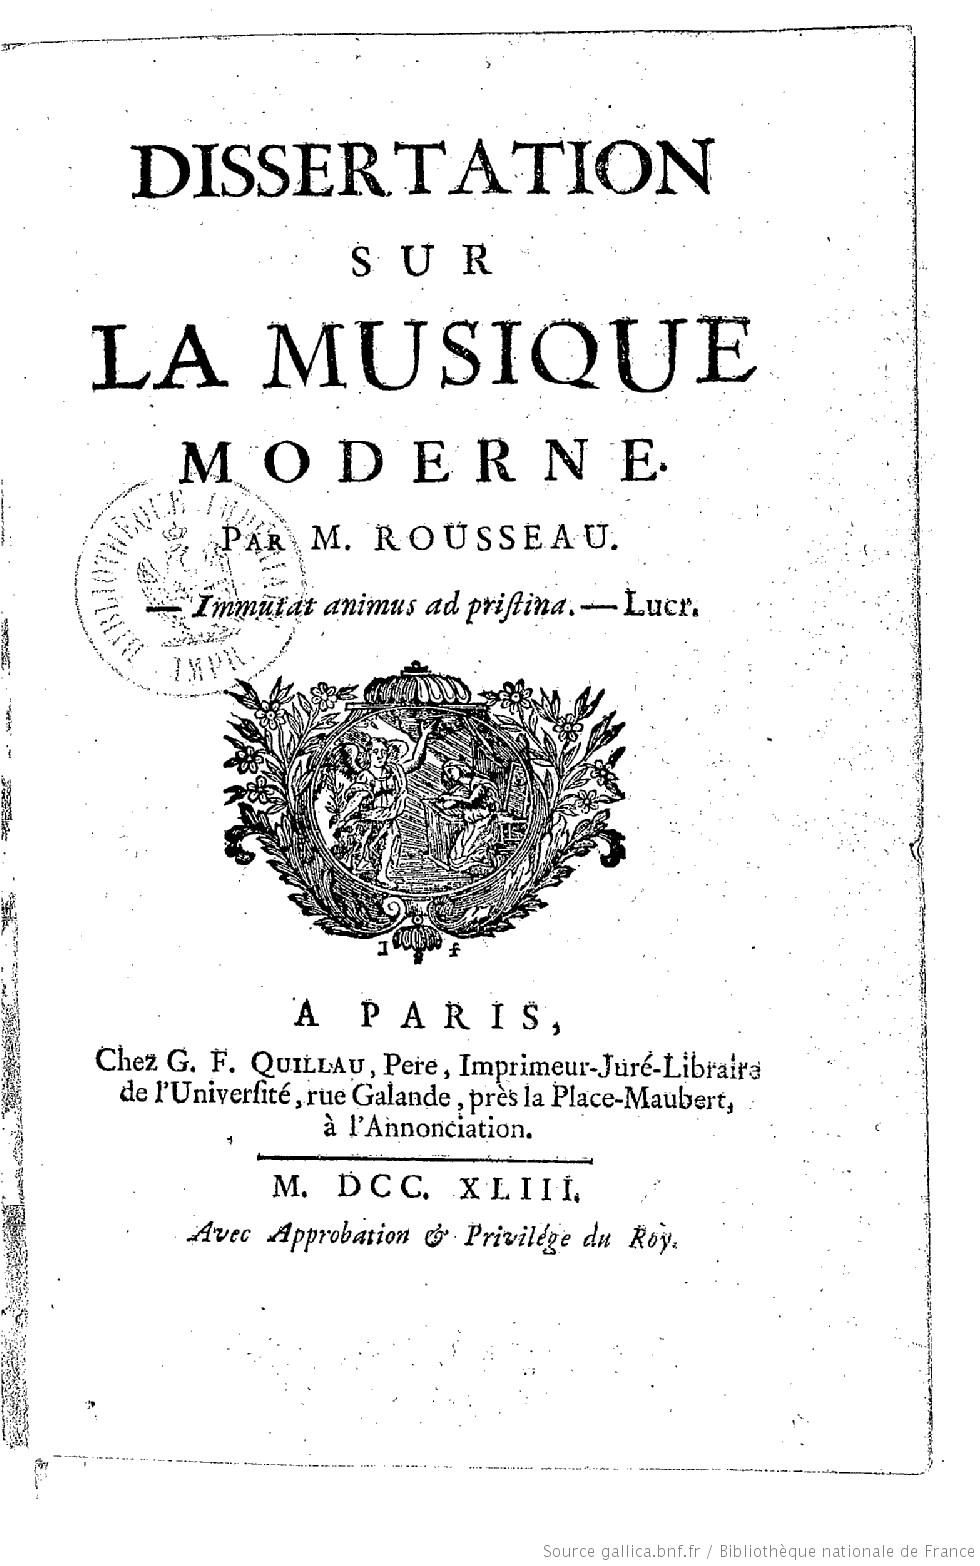 https://gallica.bnf.fr/ark:/12148/bpt6k5626542x/f4.highres